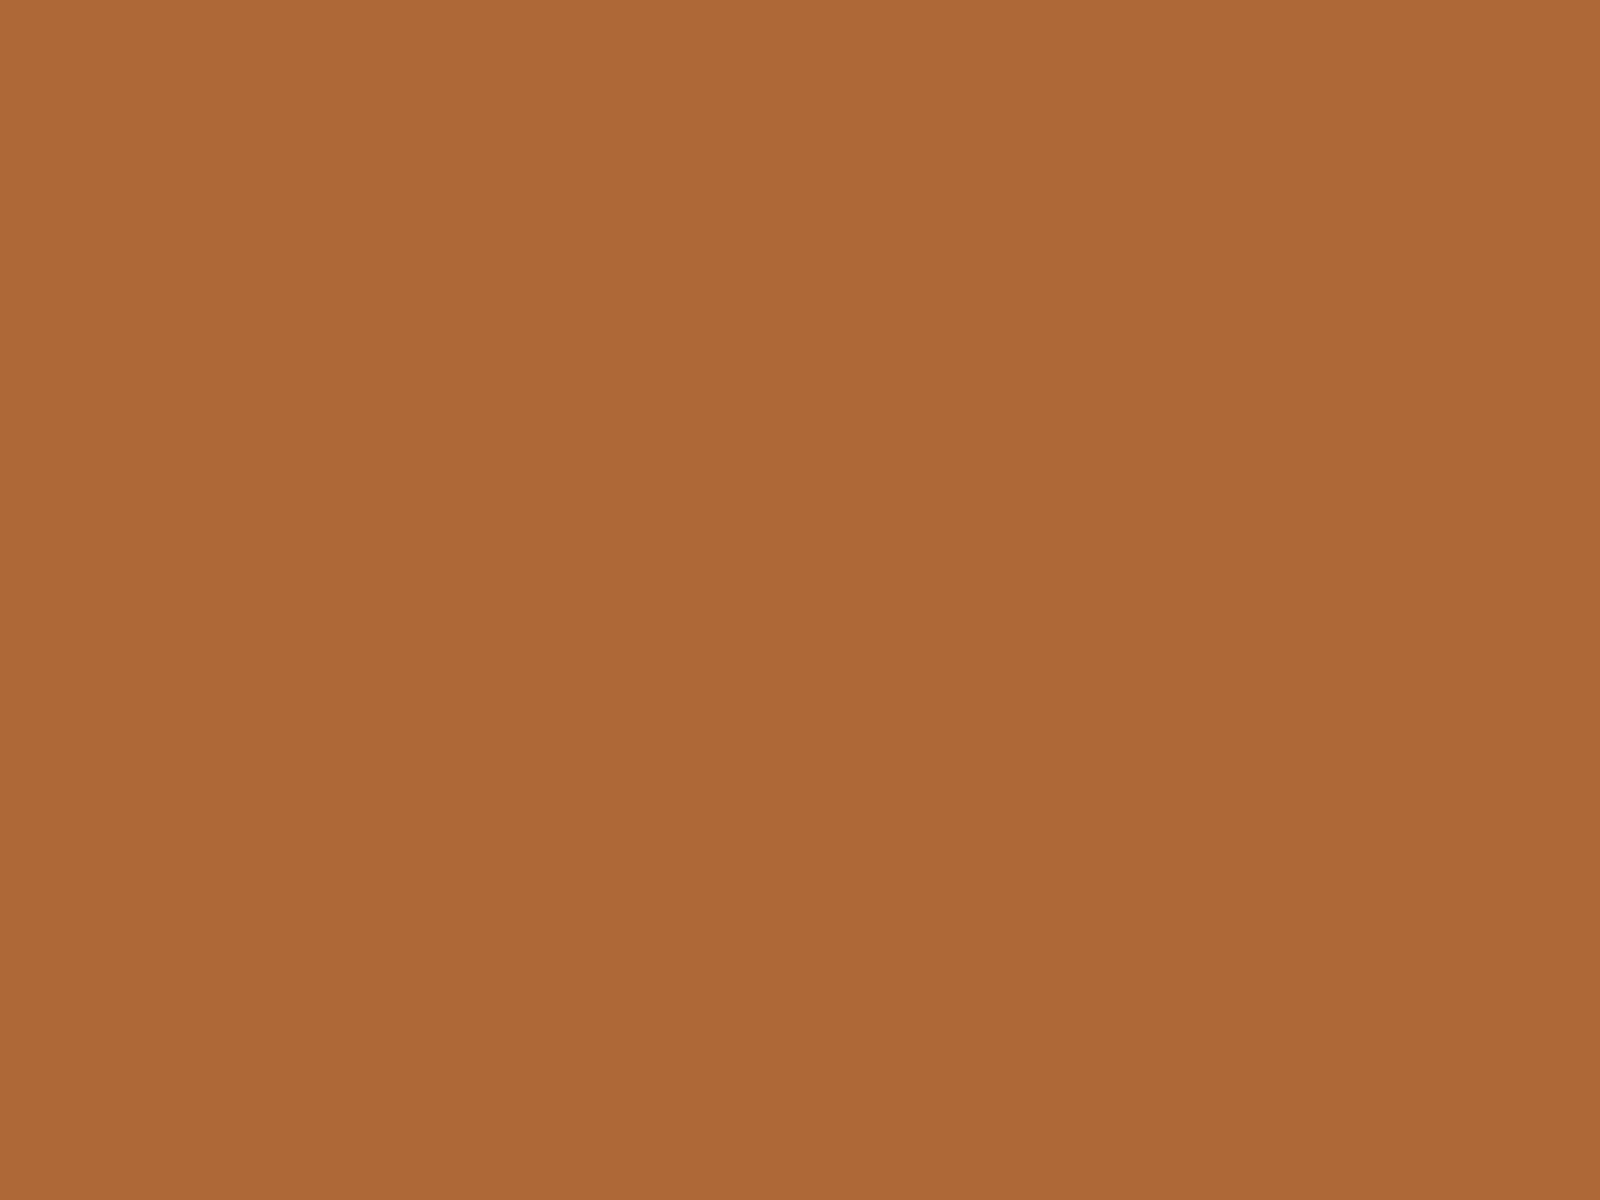 1600x1200 Windsor Tan Solid Color Background